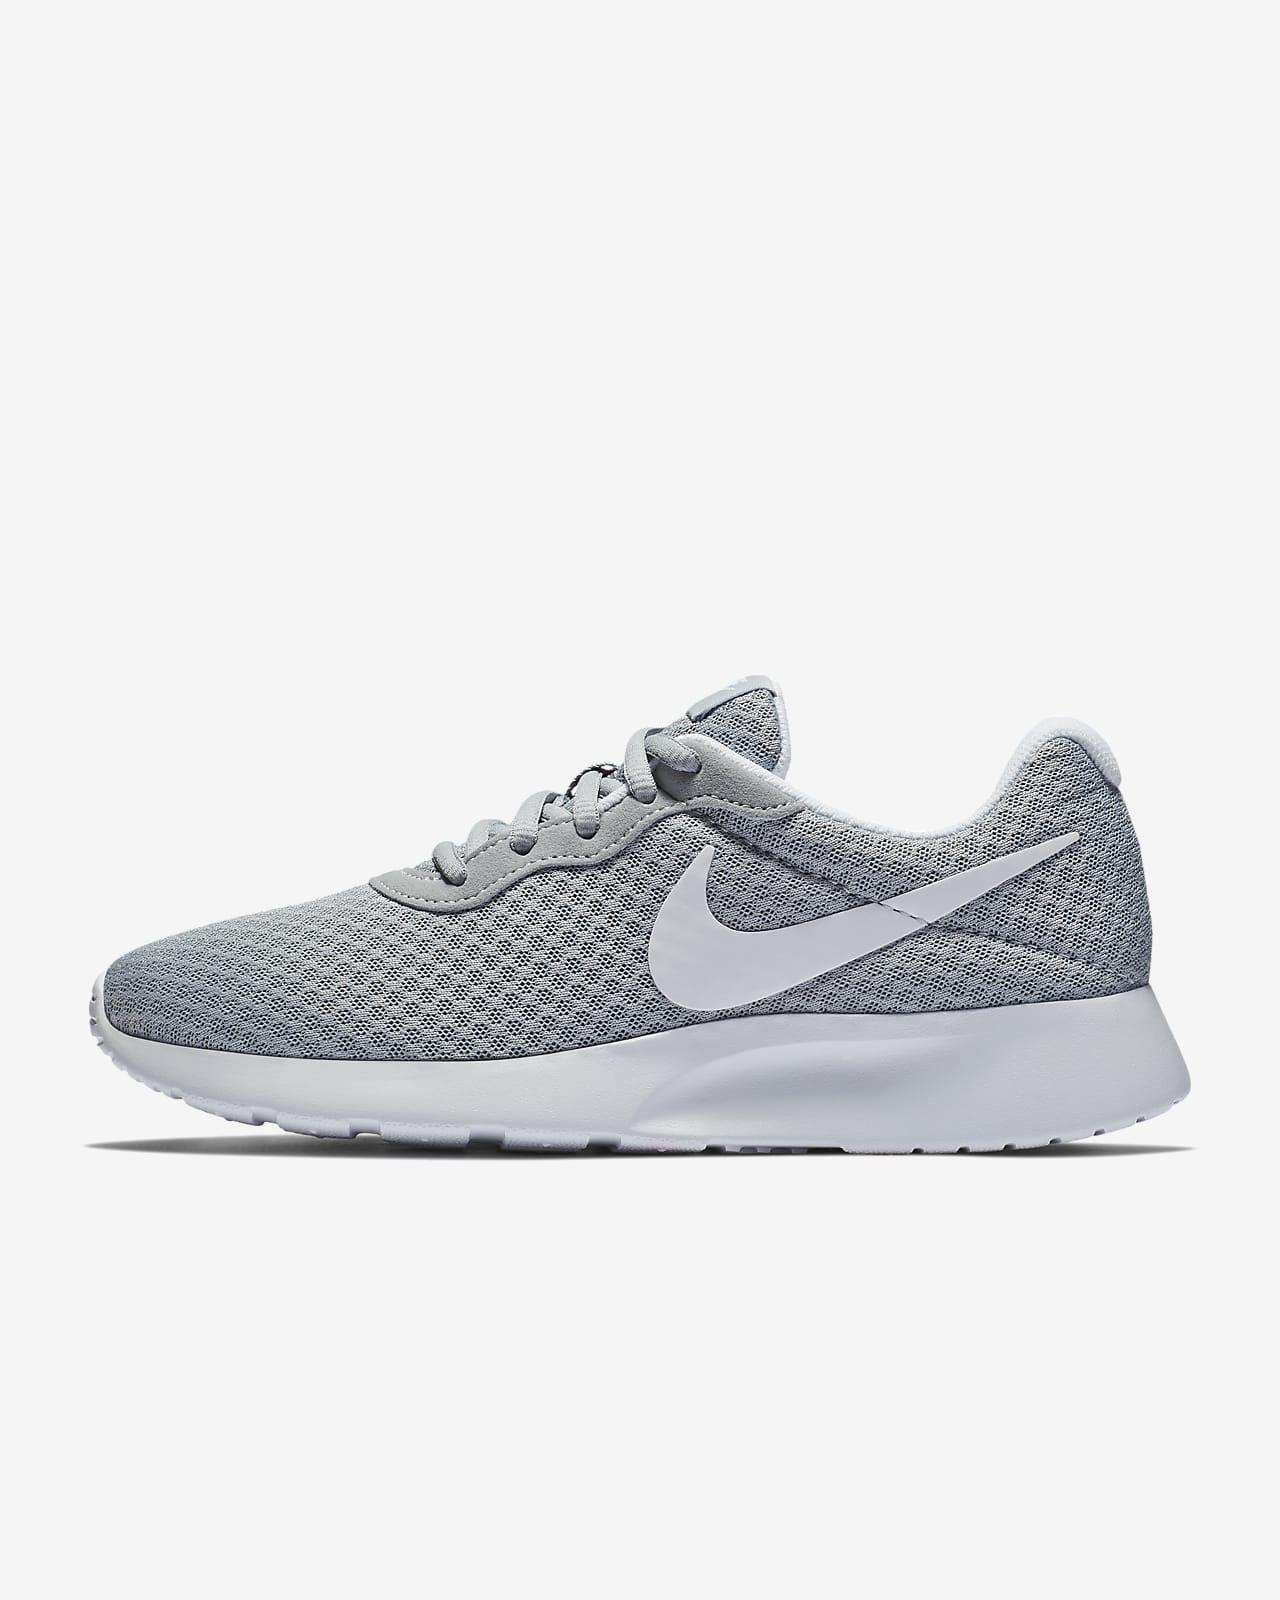 Fortalecer grua jamón  Nike Tanjun Women's Shoe. Nike MY